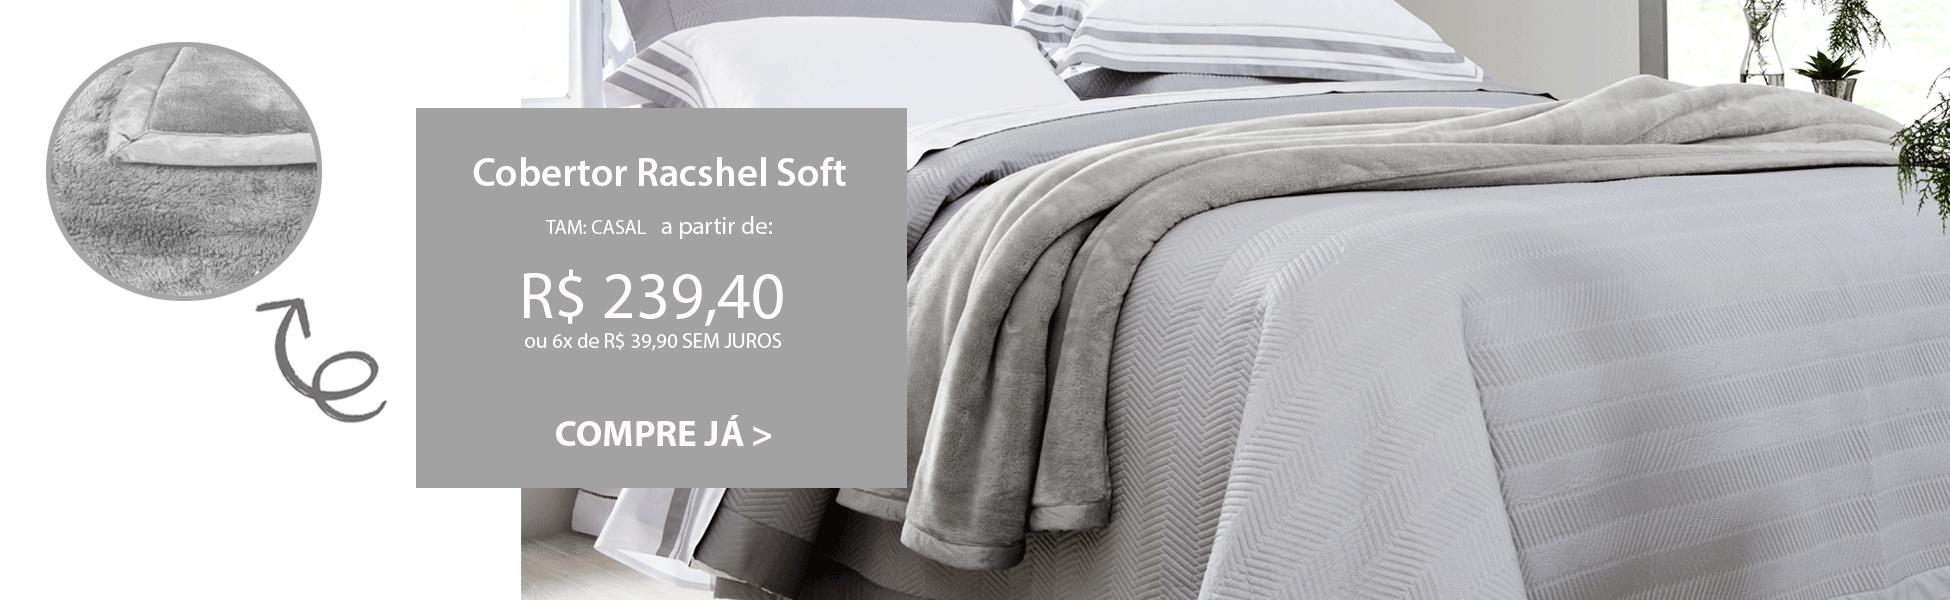 Merchan Cobertores 340